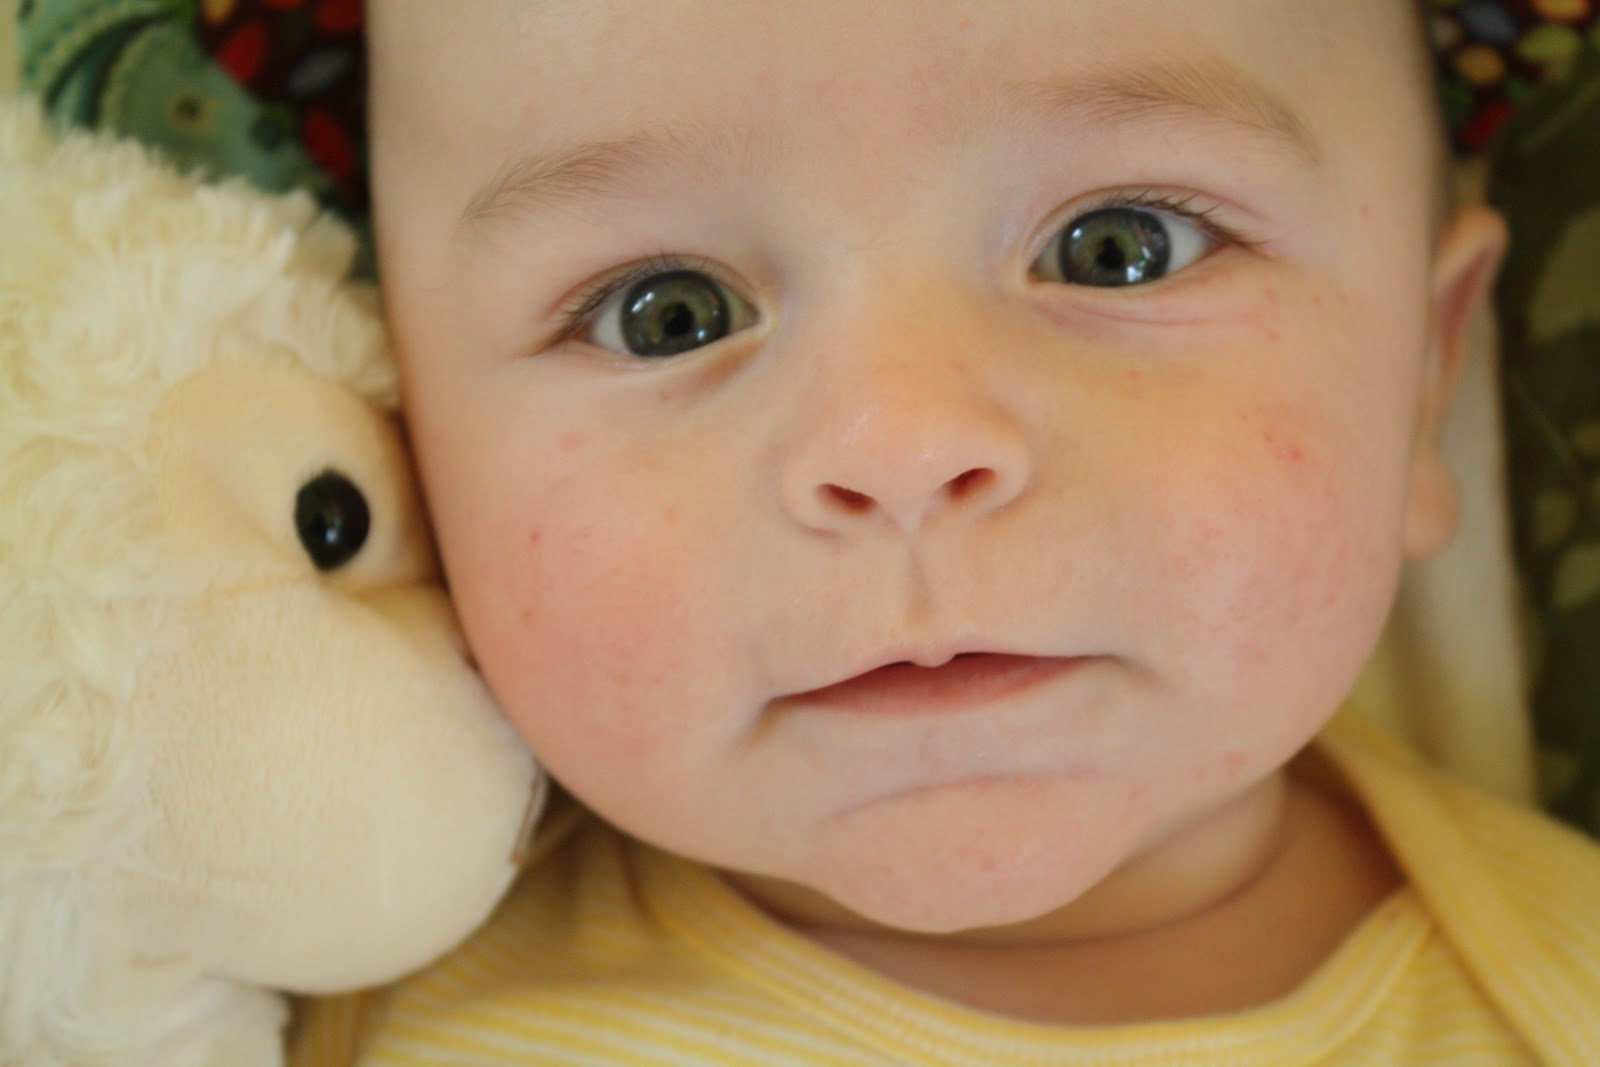 Cute Baby Boy With Green Eyes Tumblr | www.pixshark.com ...